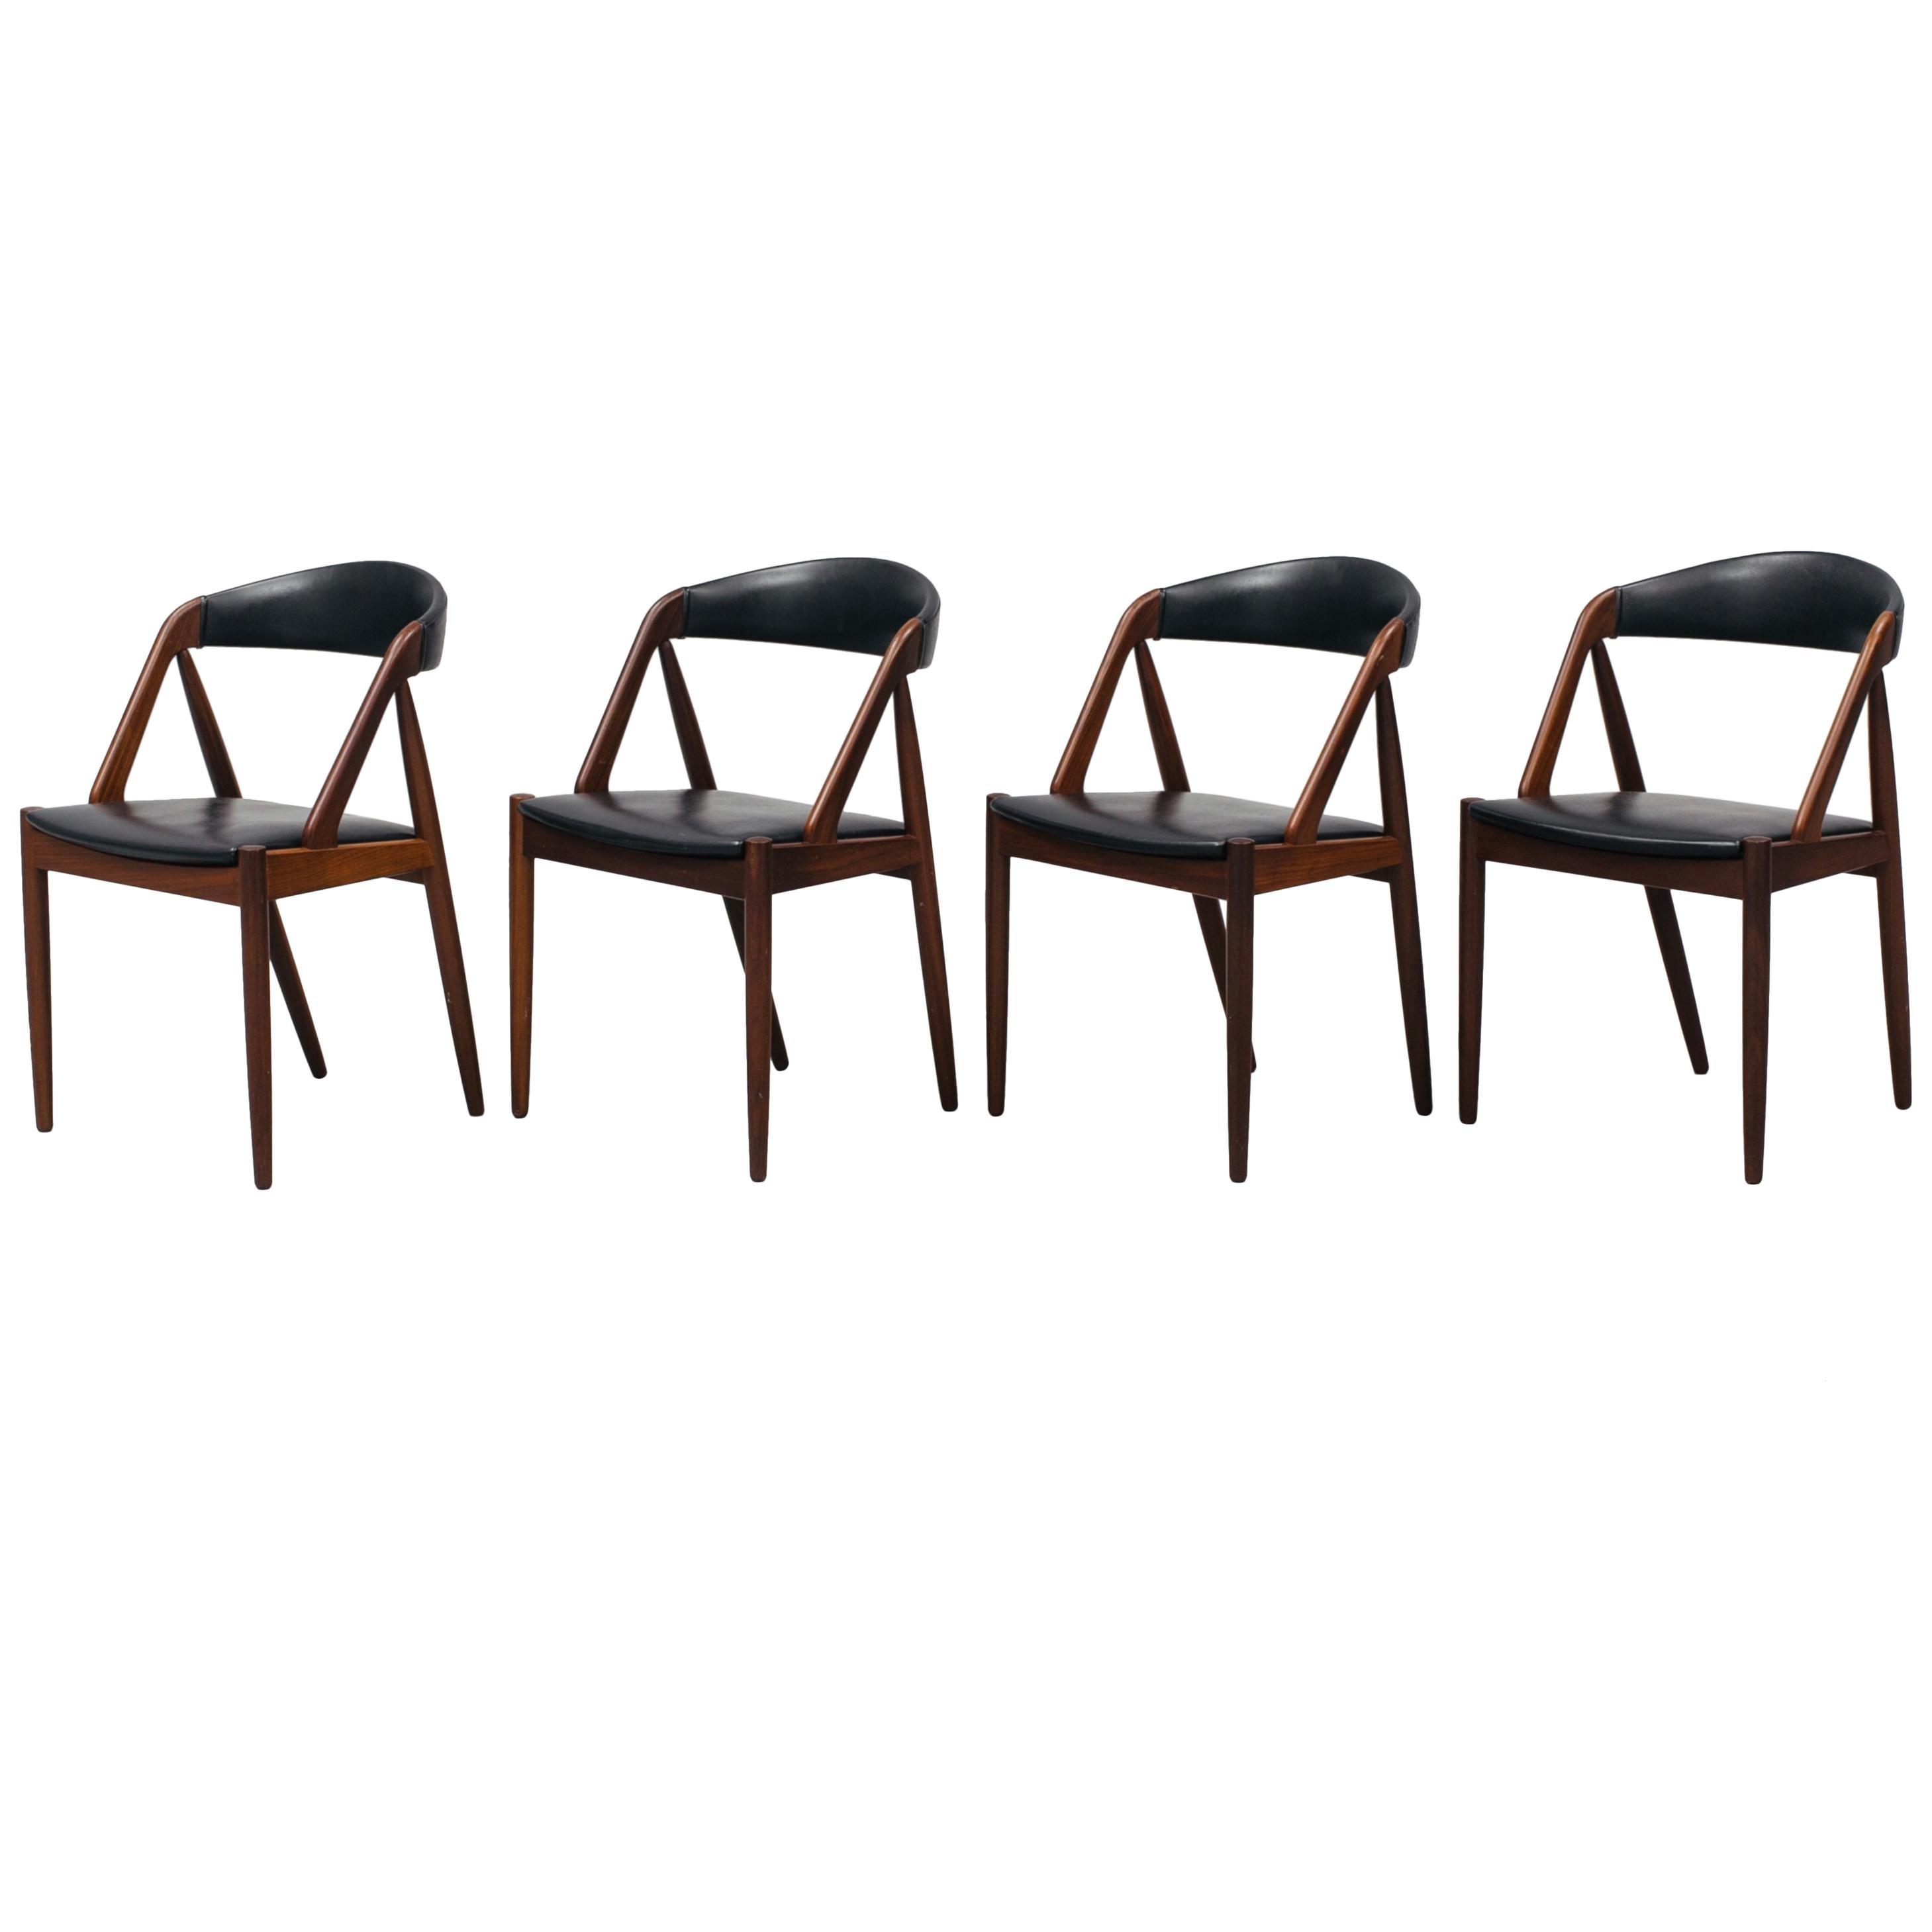 Kai Kristiansen Mahogany Dining Chairs Model 31, Denmark, 1960